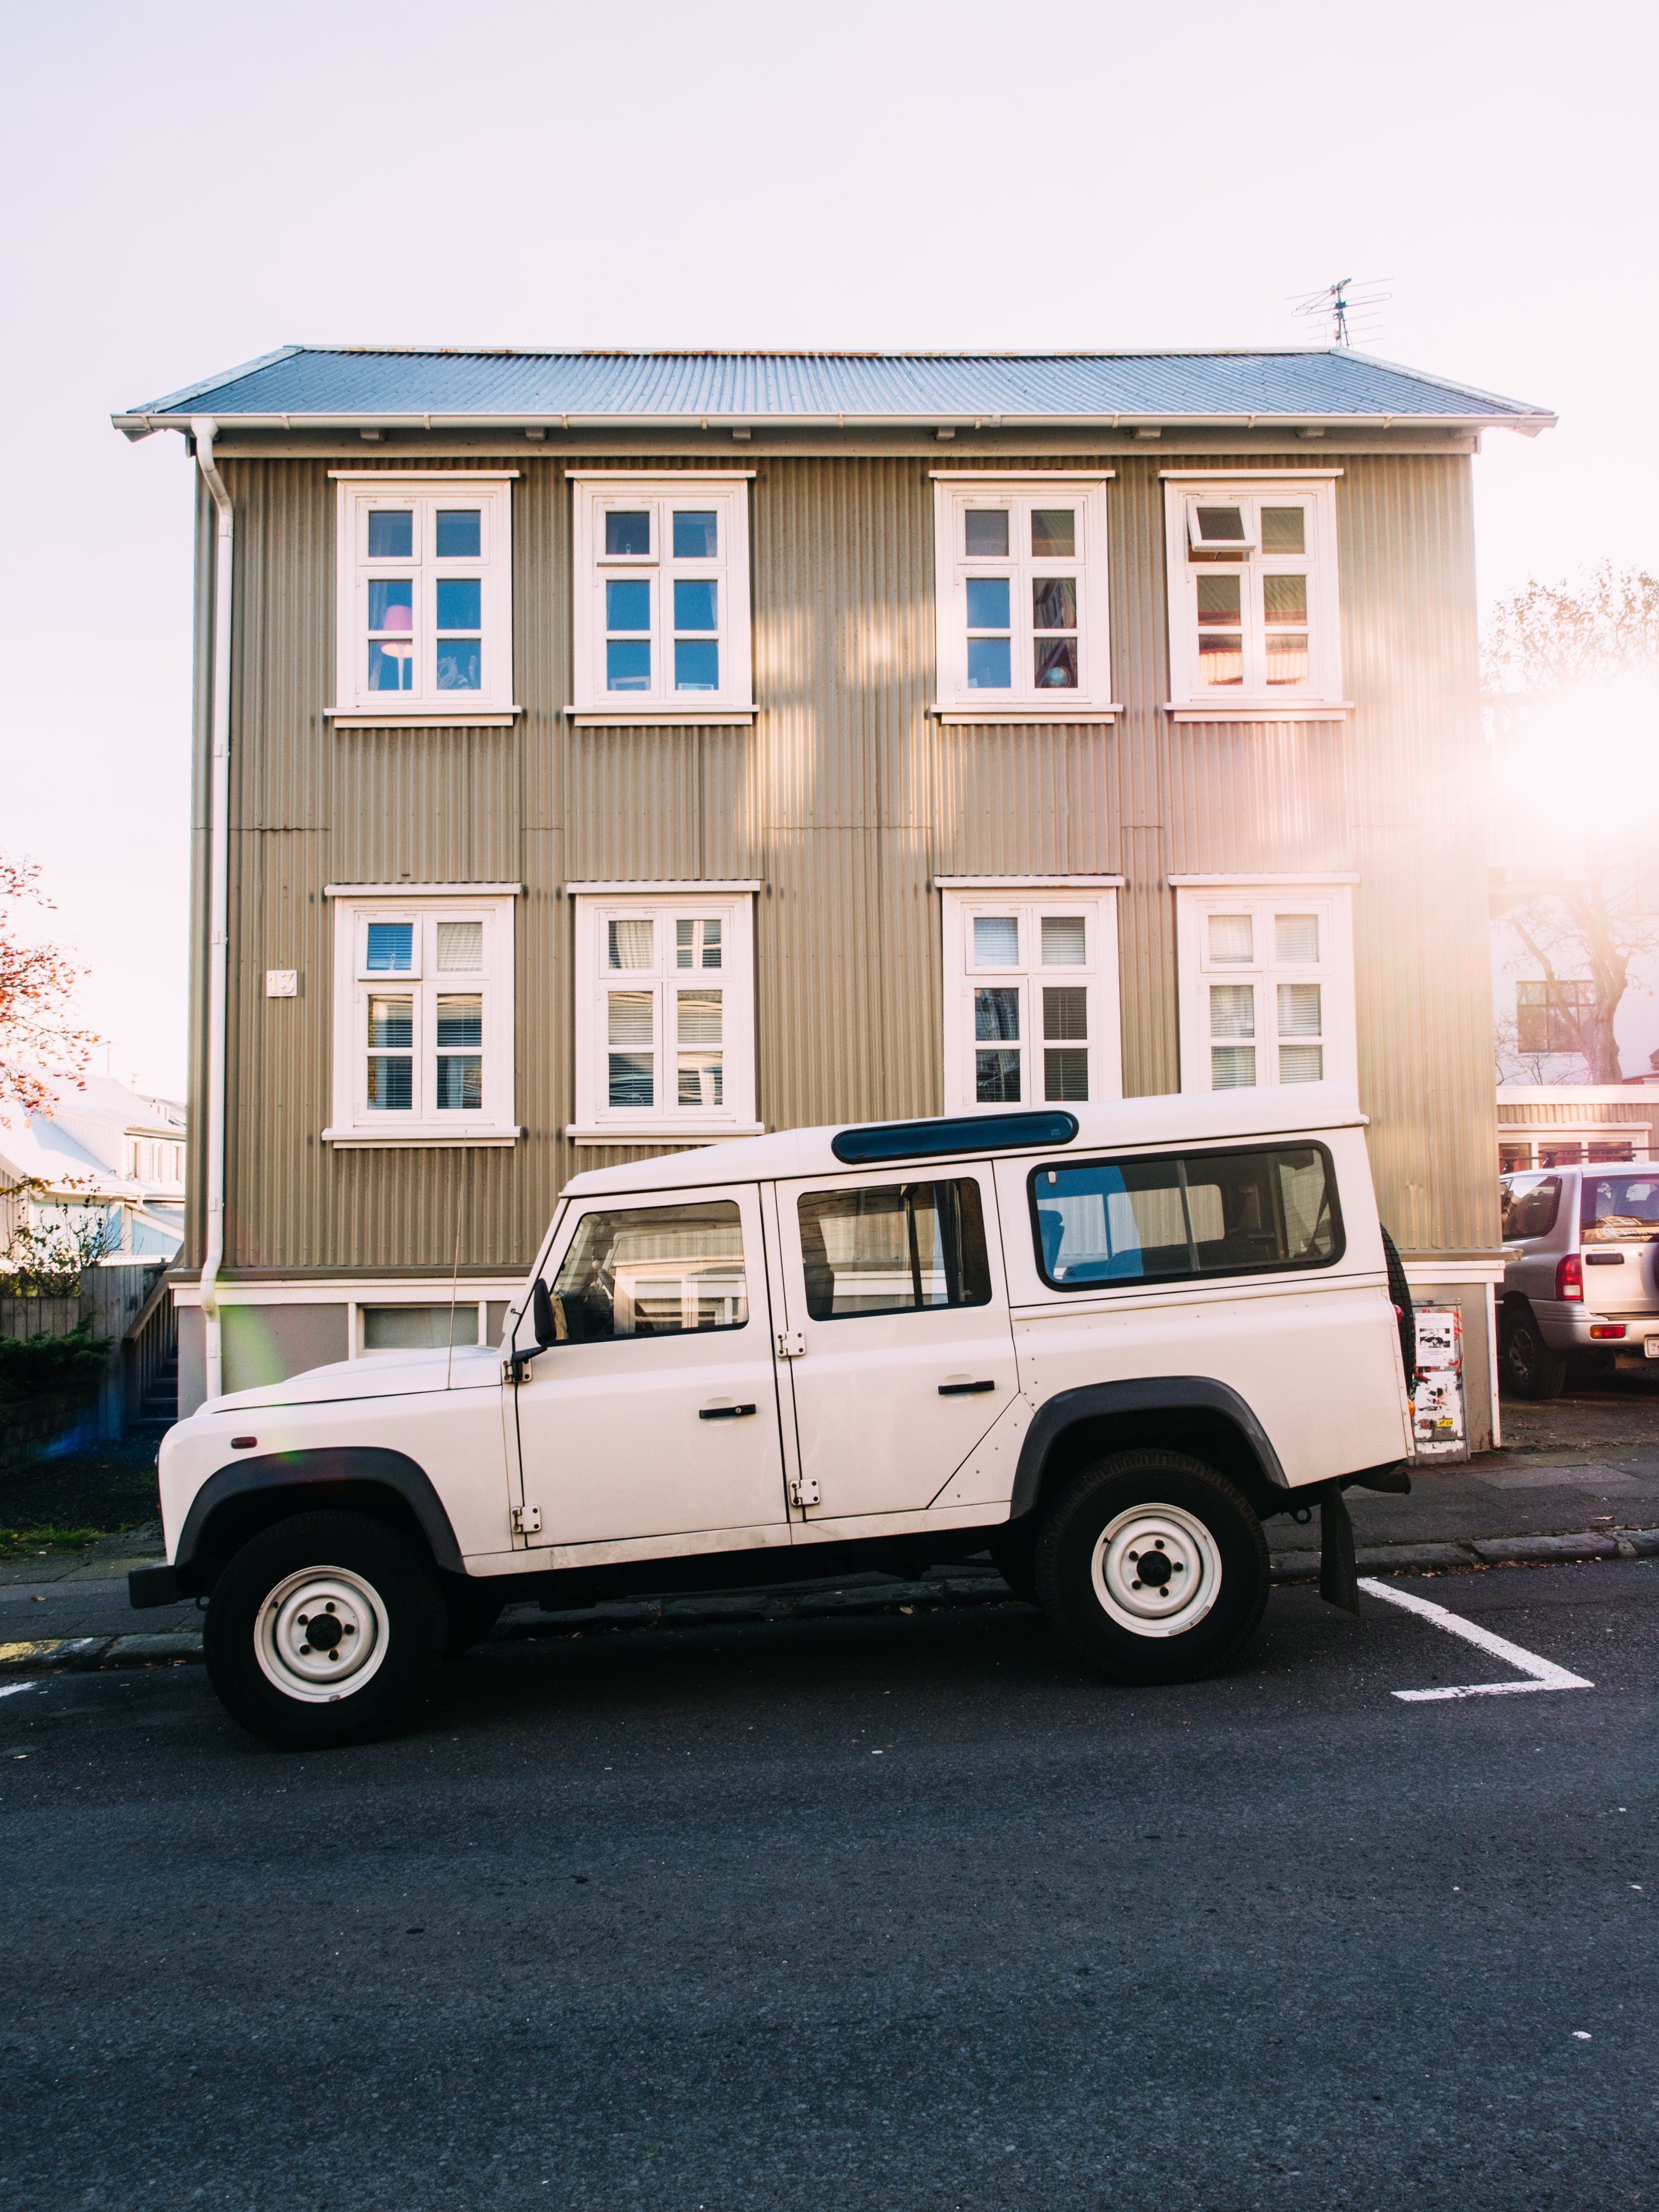 Mejores hipotecas febrero 2016